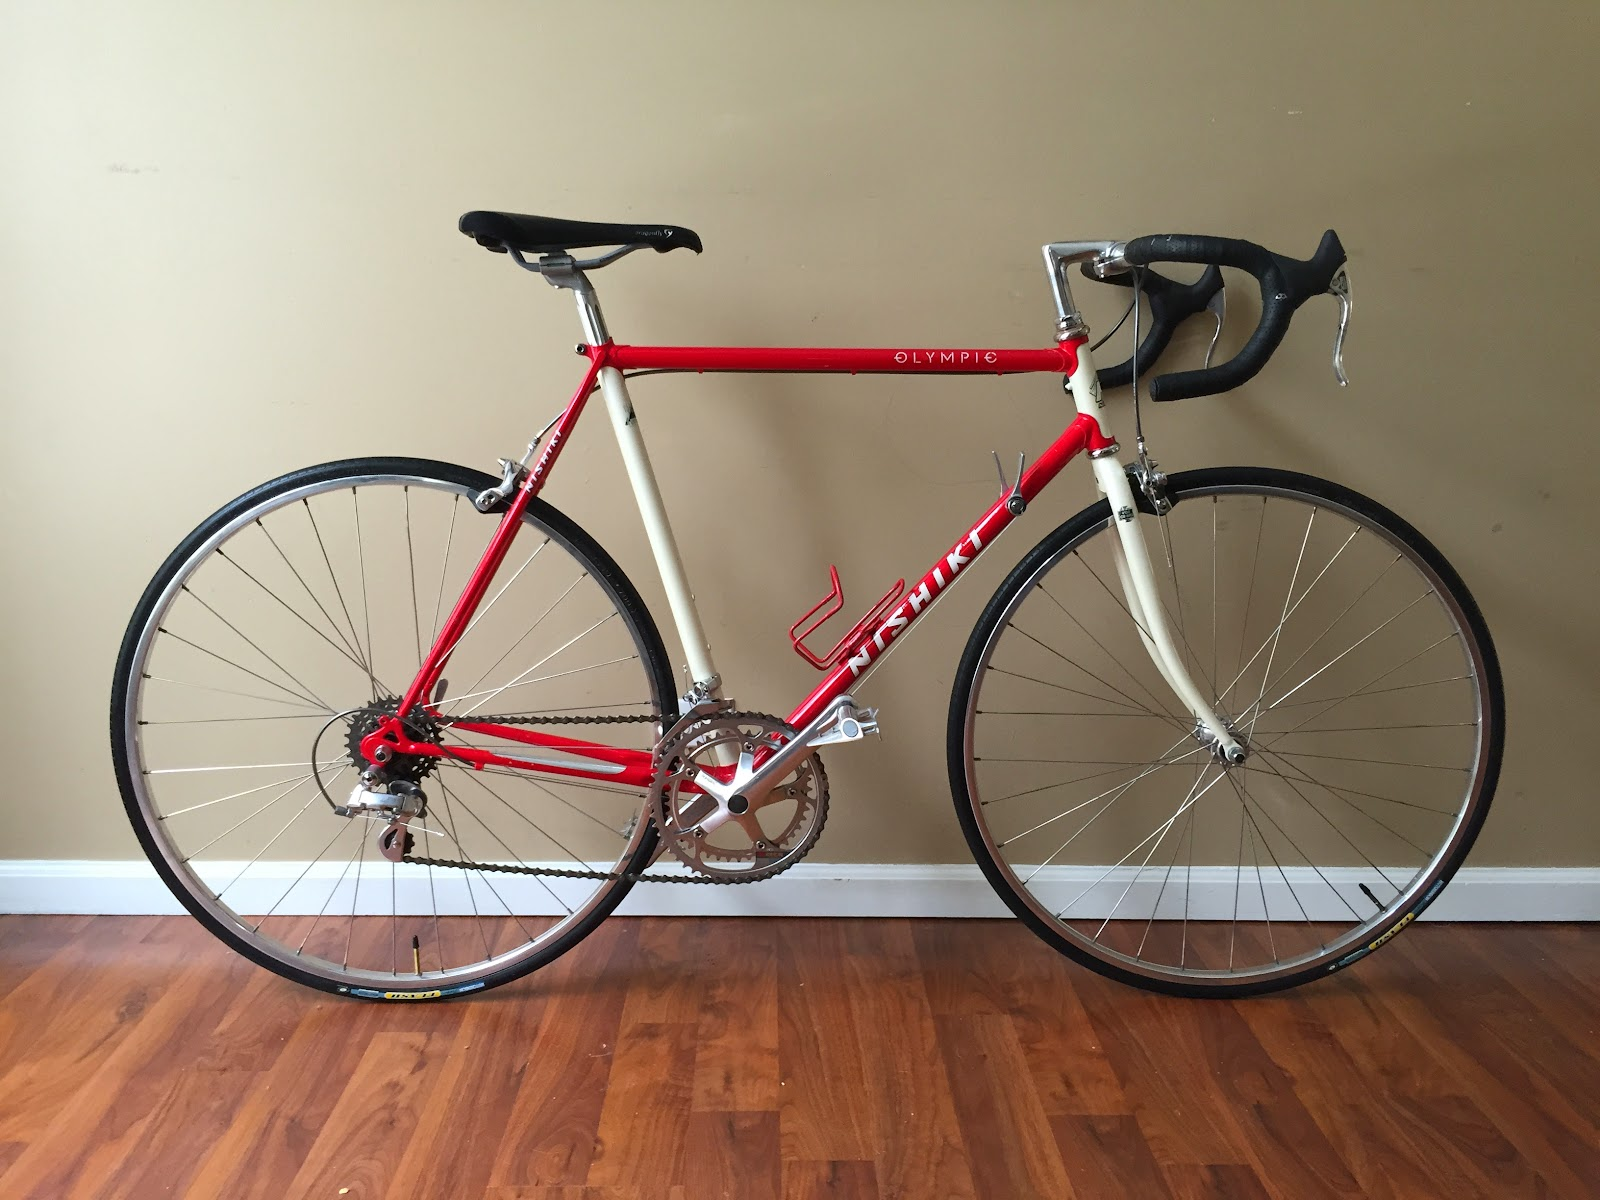 John S Bicycle Restorations 1988 Nishiki Olympic Restoration